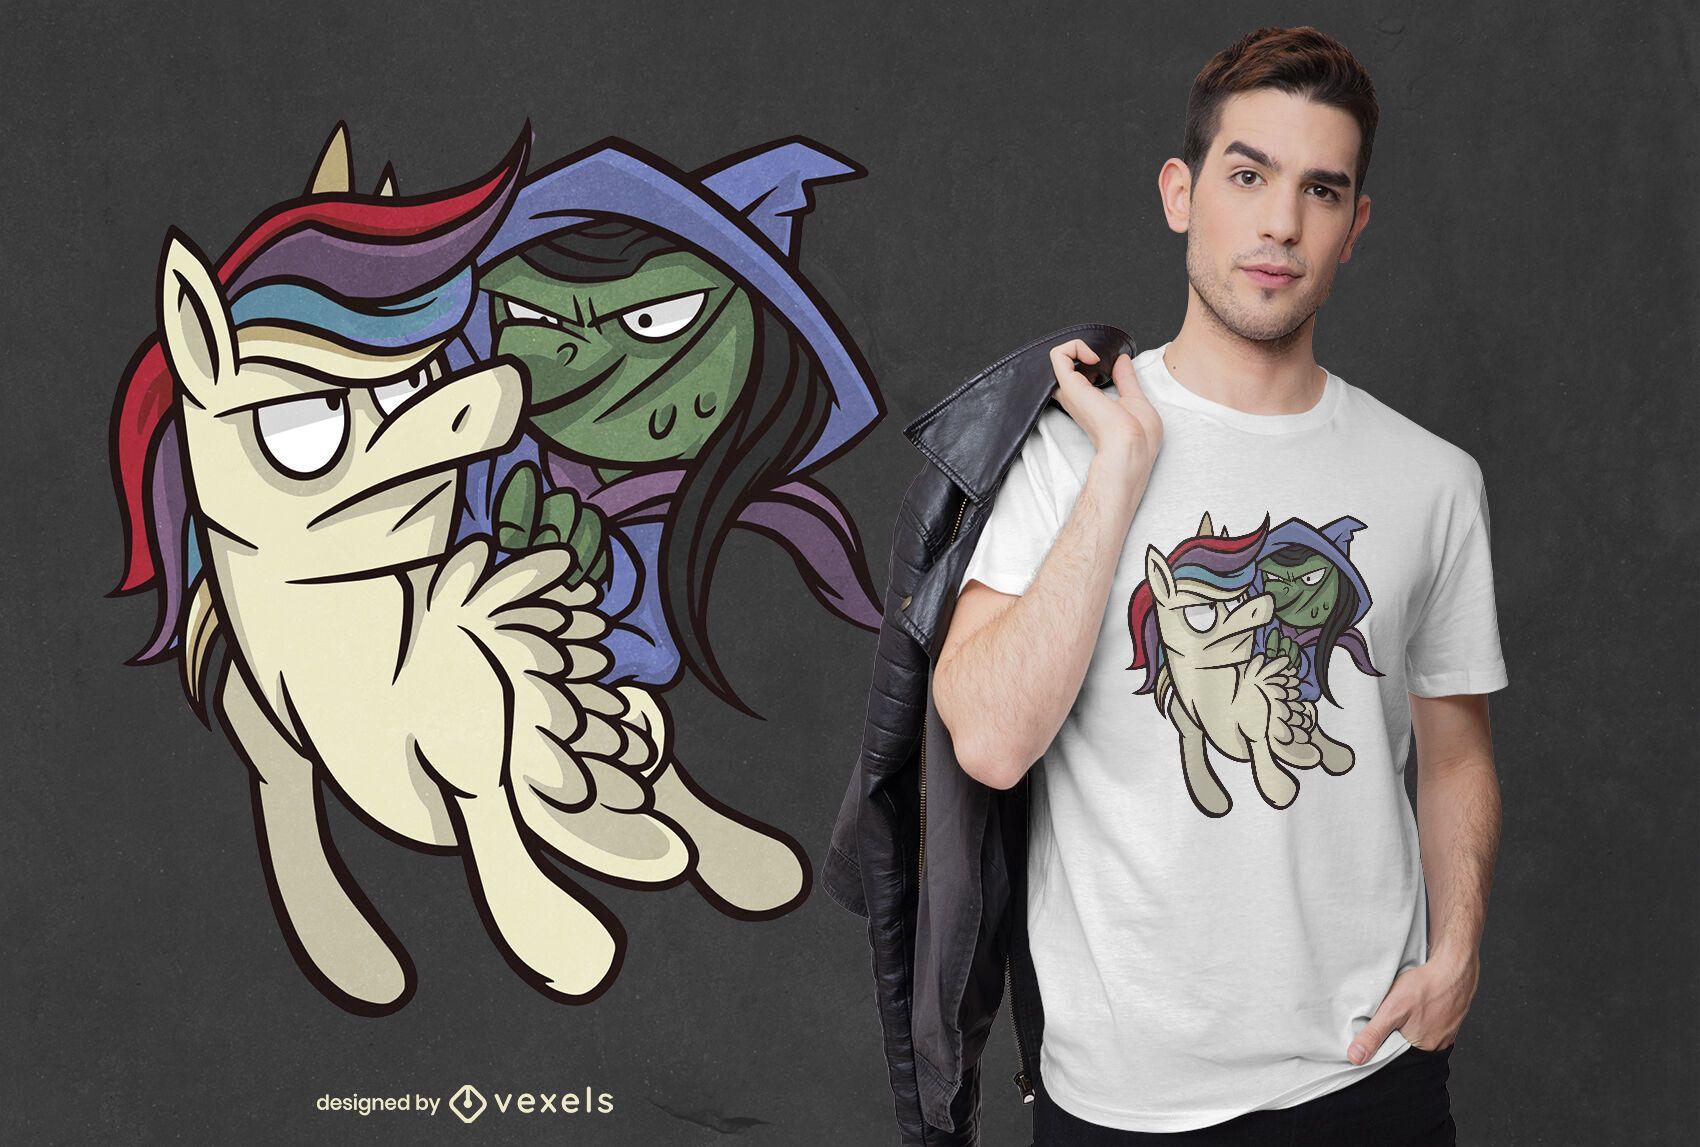 Diseño de camiseta de bruja y unicornio